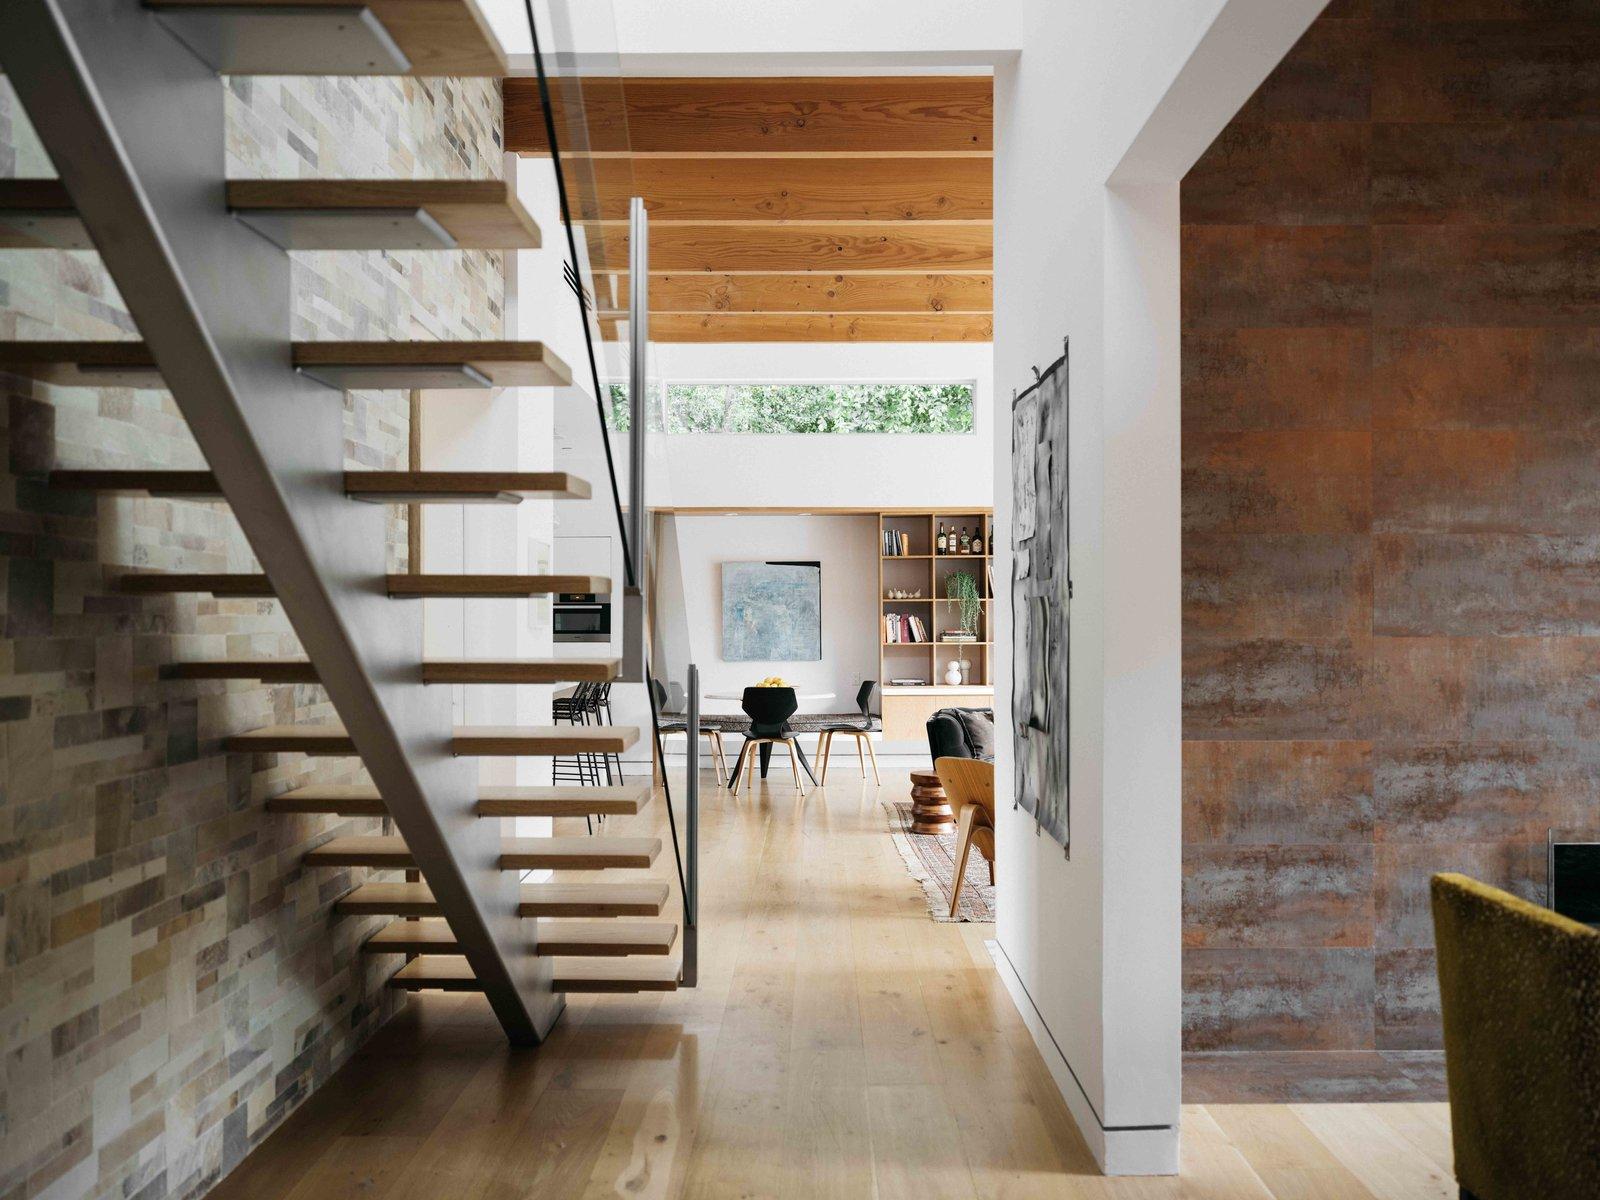 Bruno Bondanelli Los Angeles home staircase